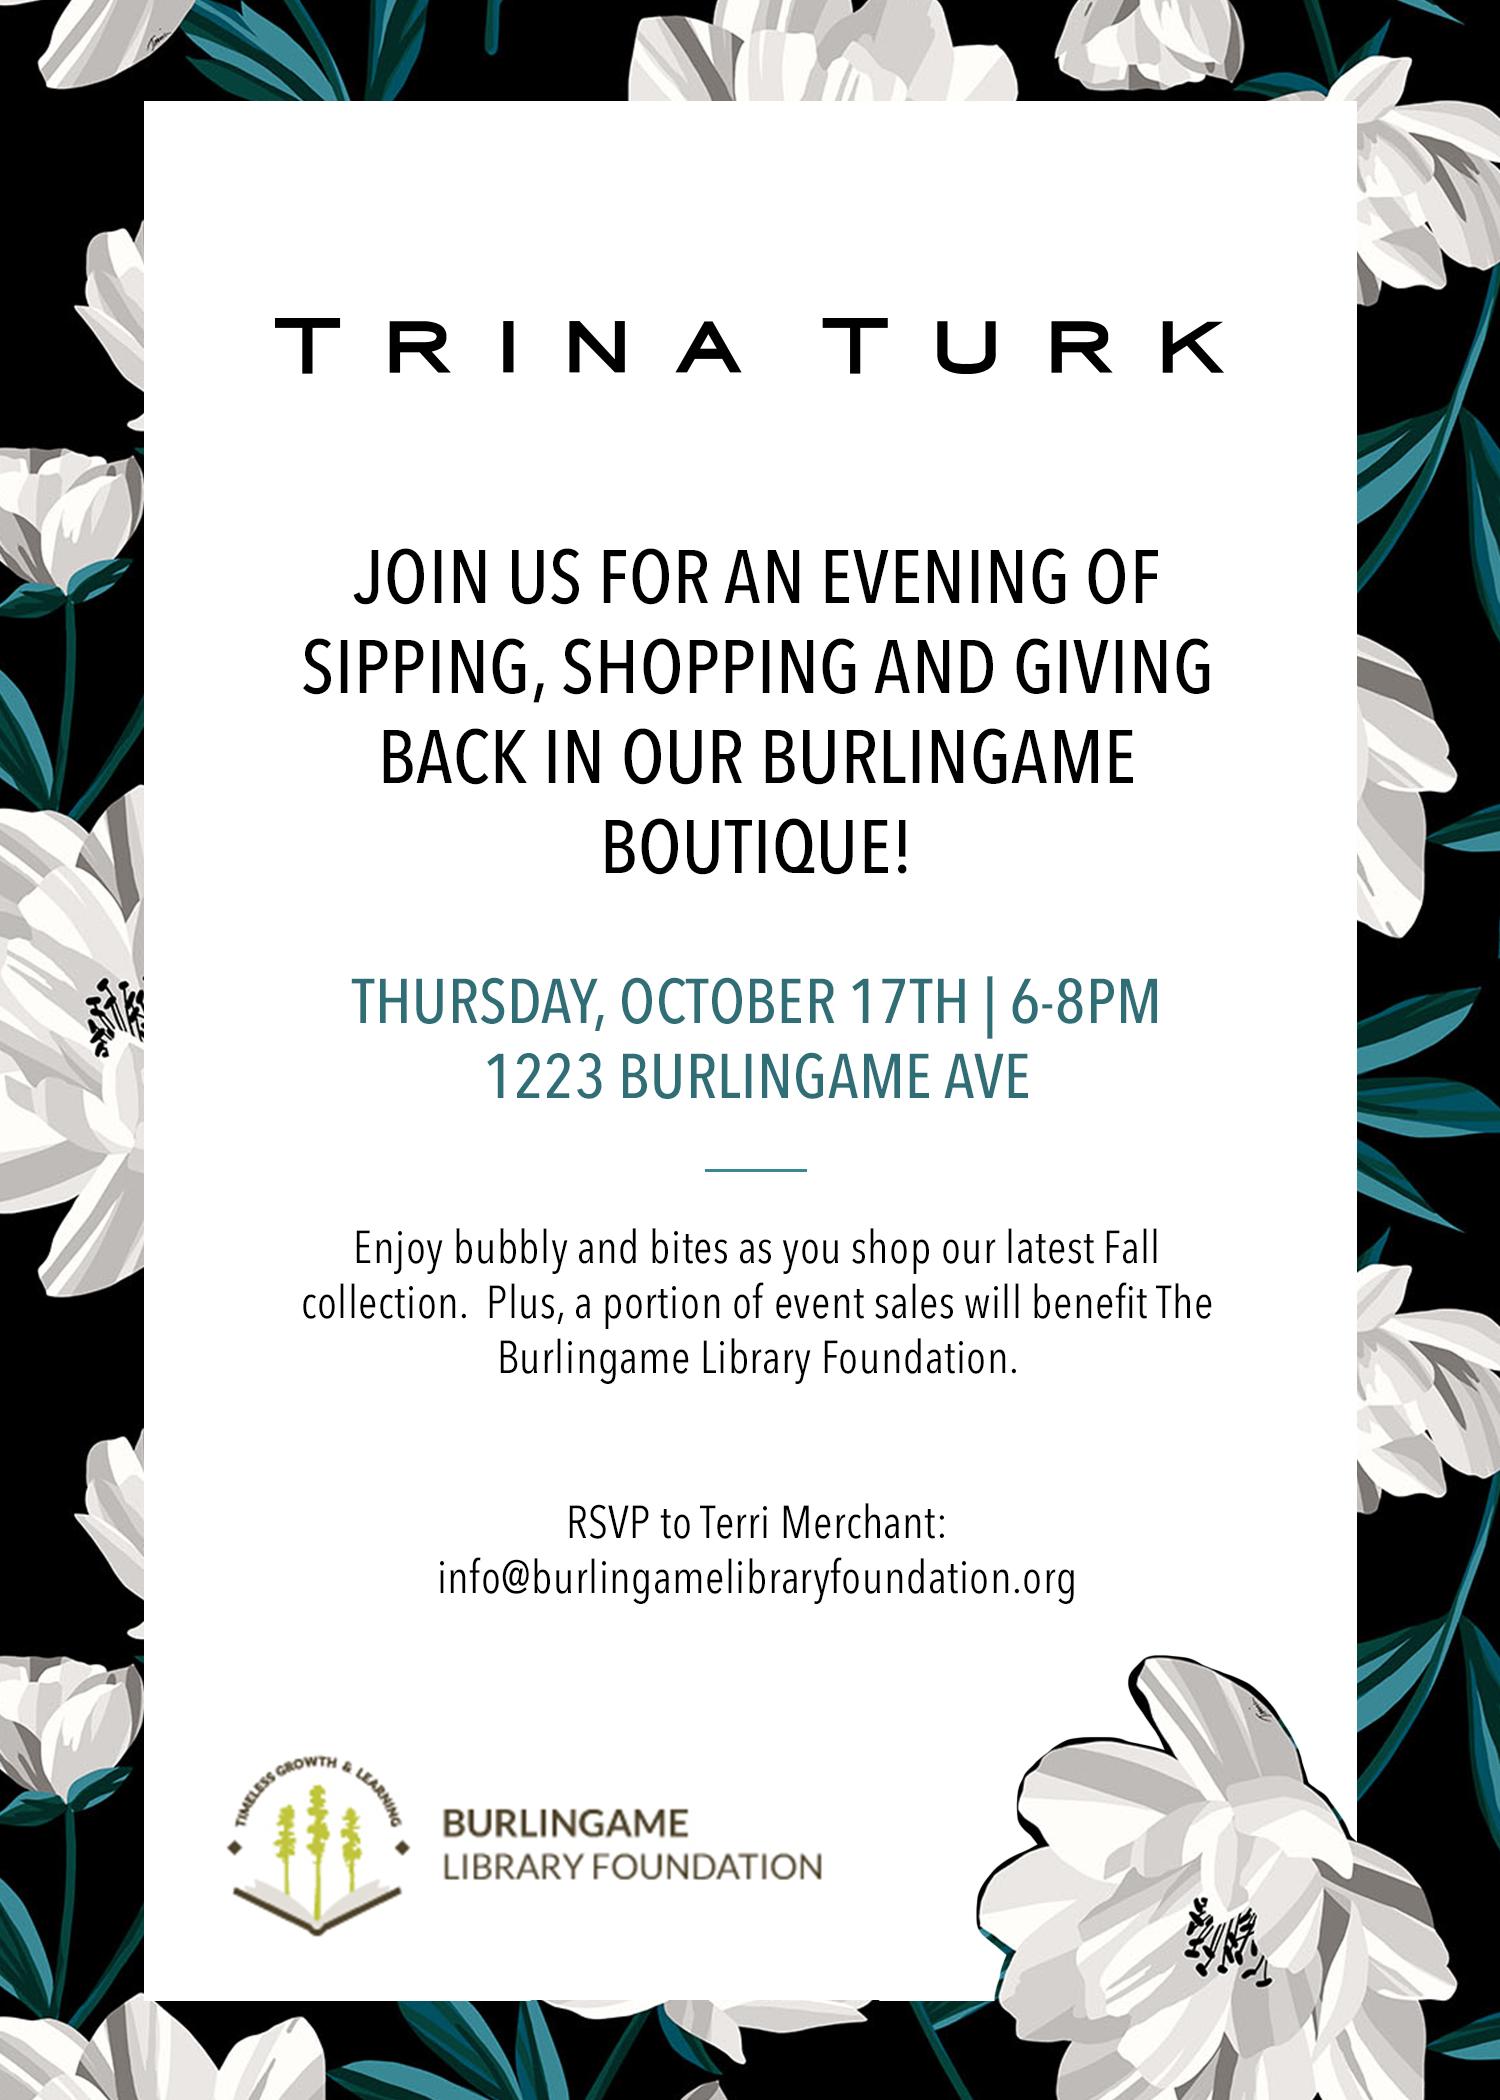 Trina Turk Event 10_17_19.jpg.png